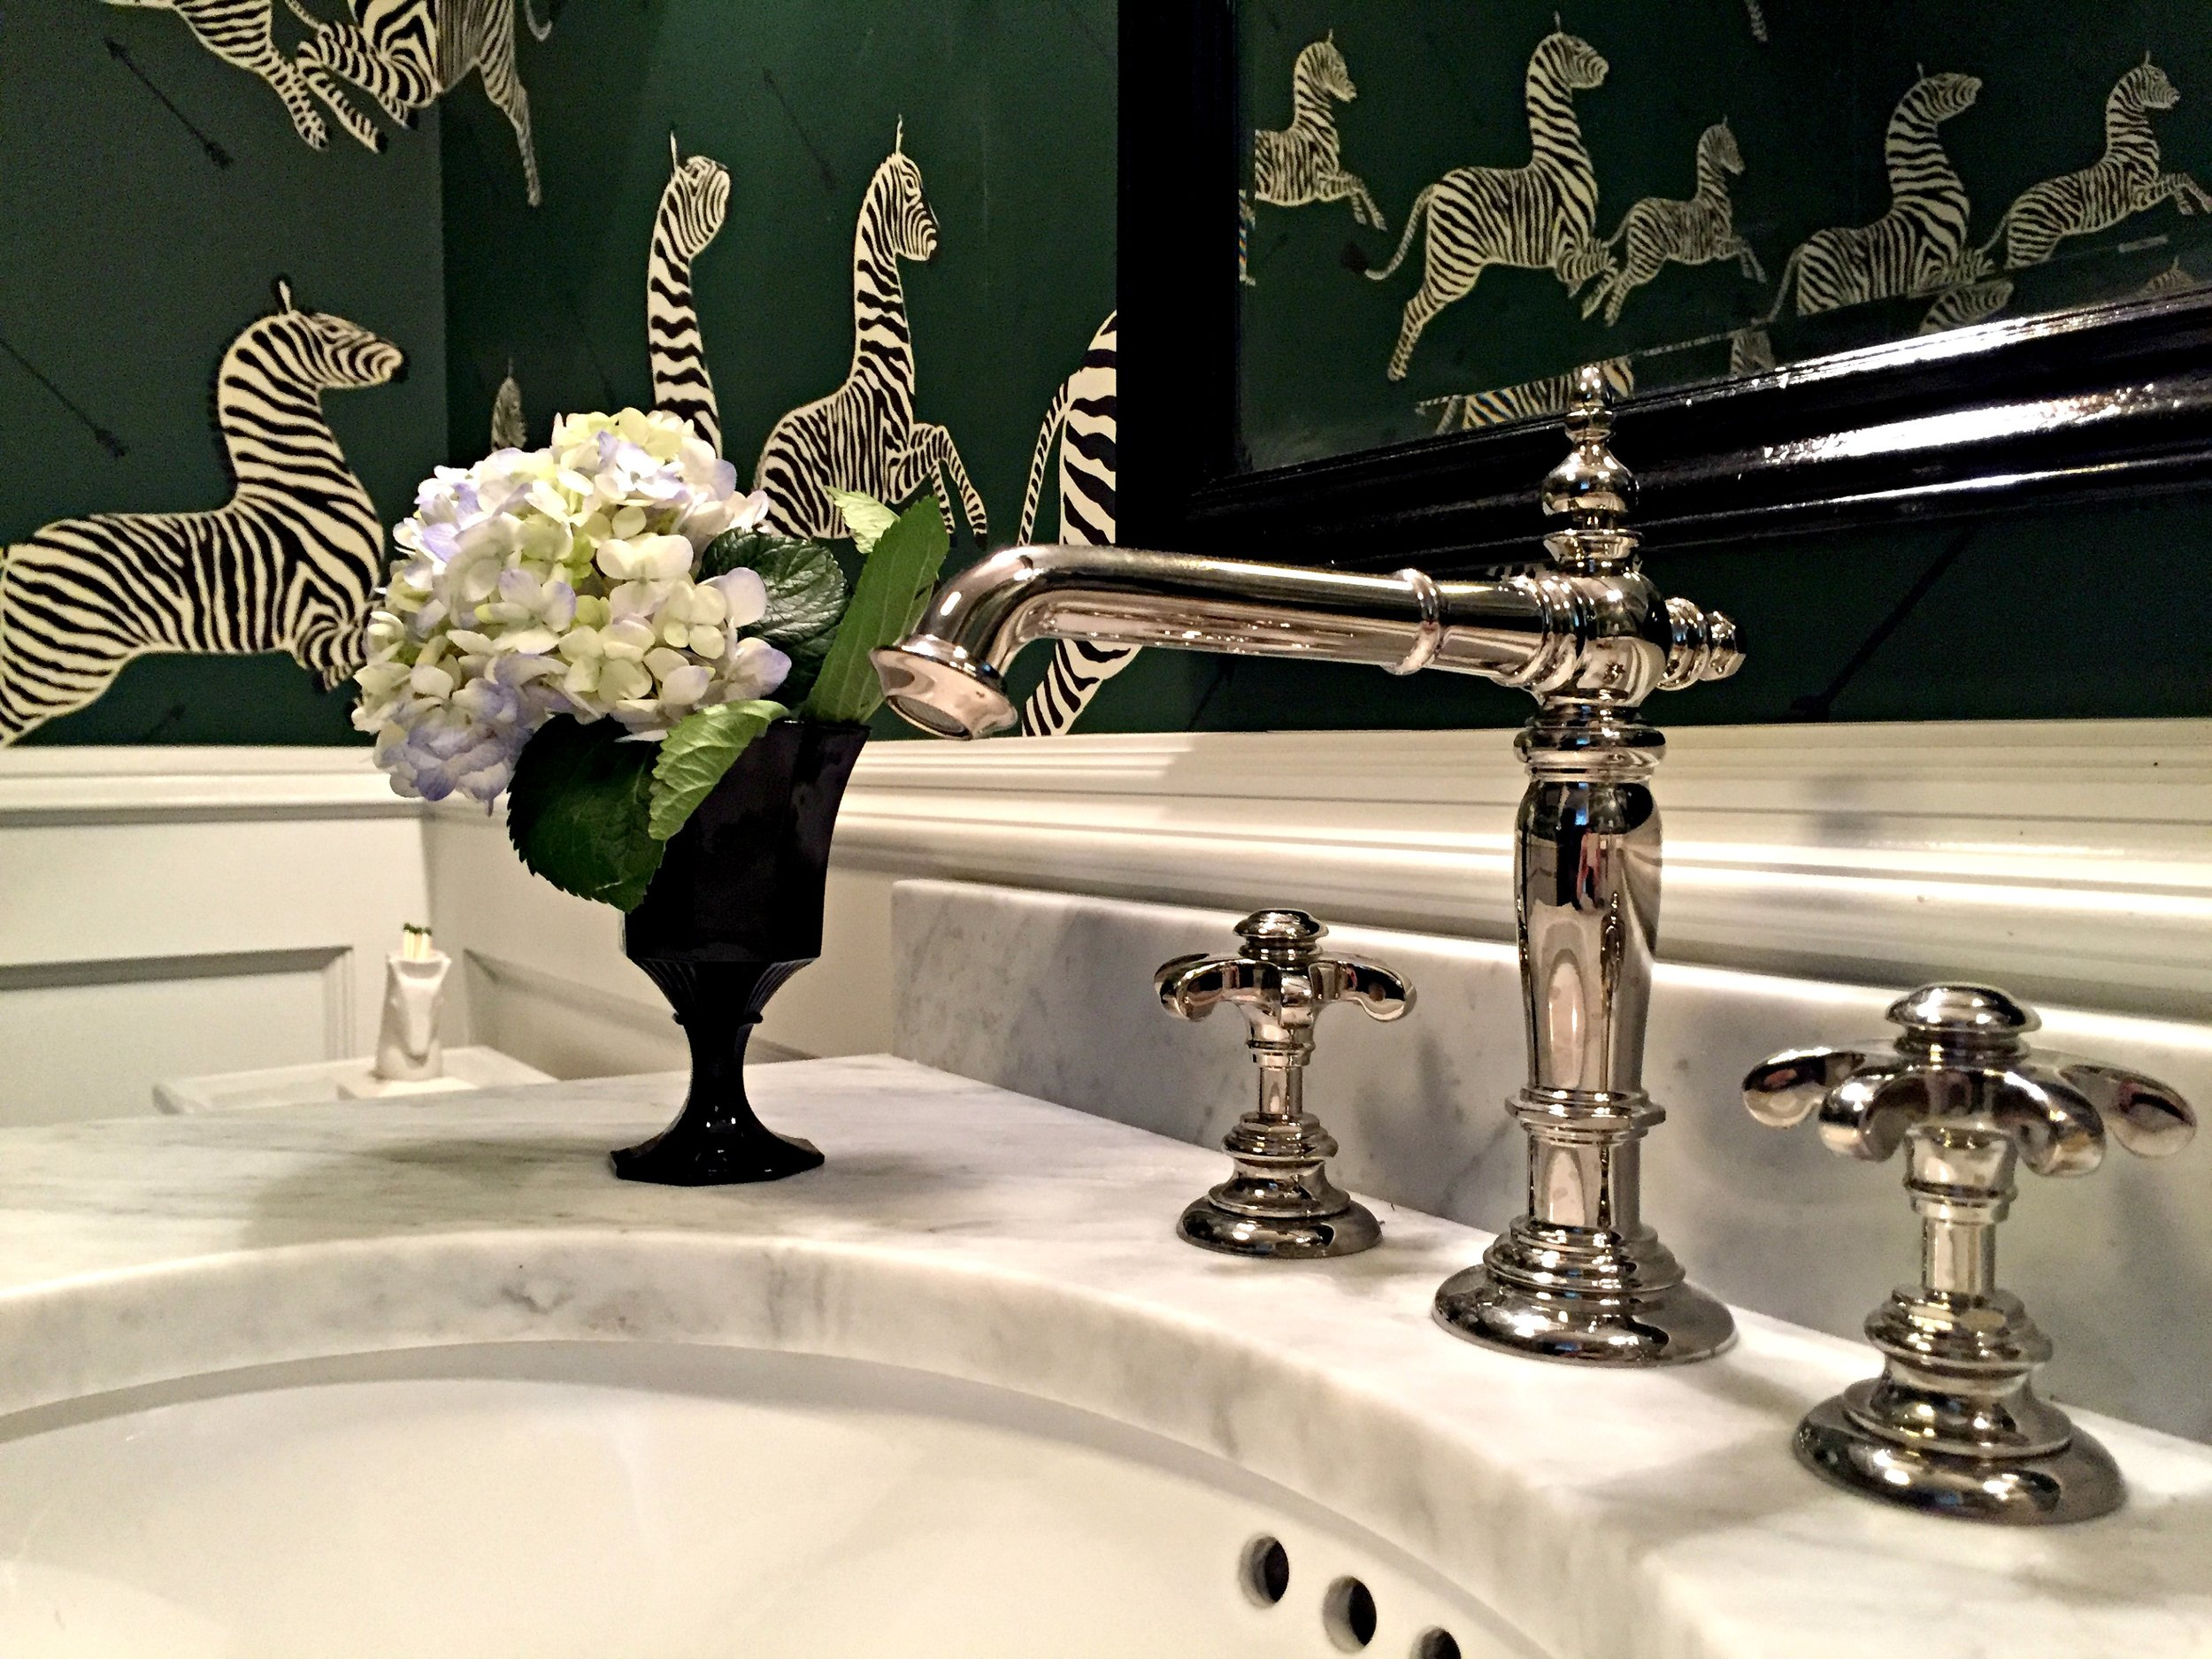 KDI Nicole Powder Room Faucet.jpg